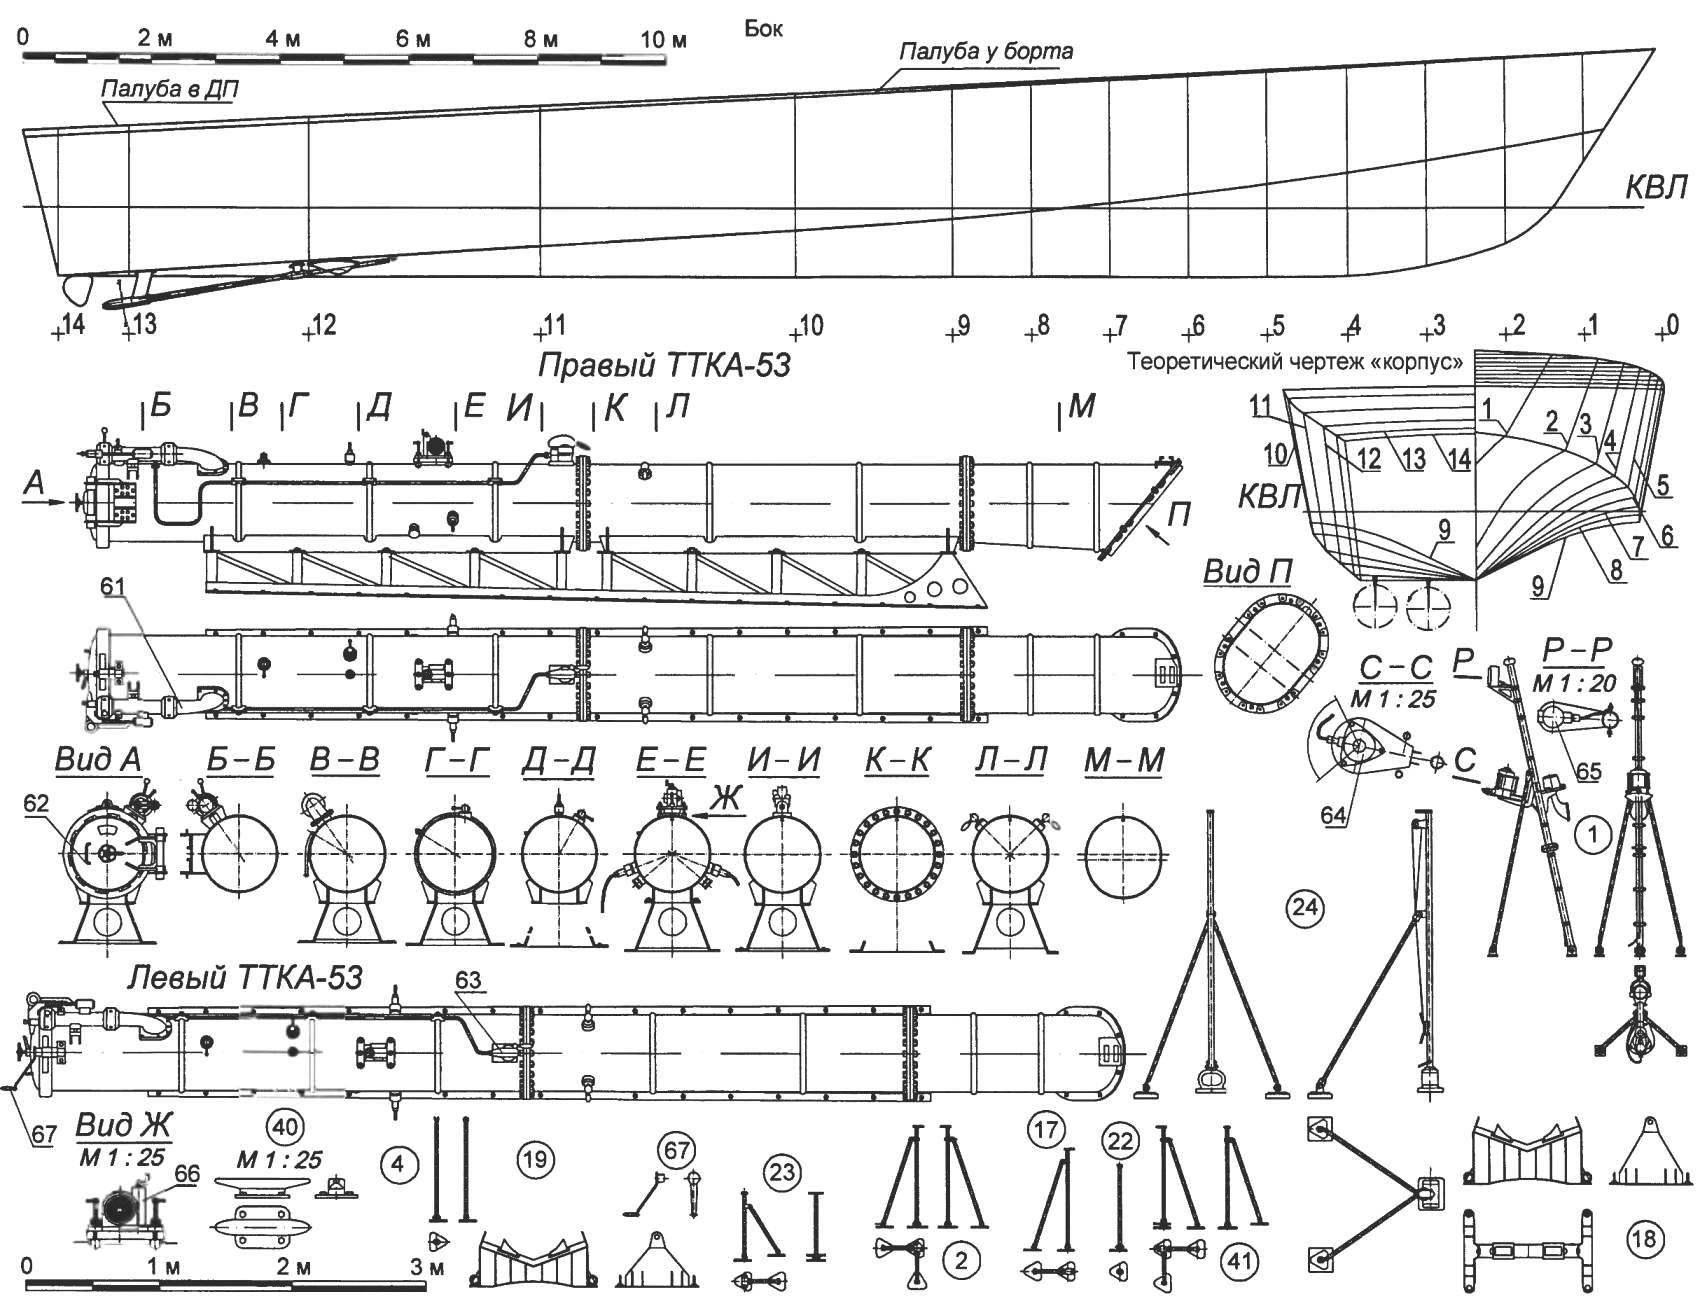 Большой торпедный катер проекта 183